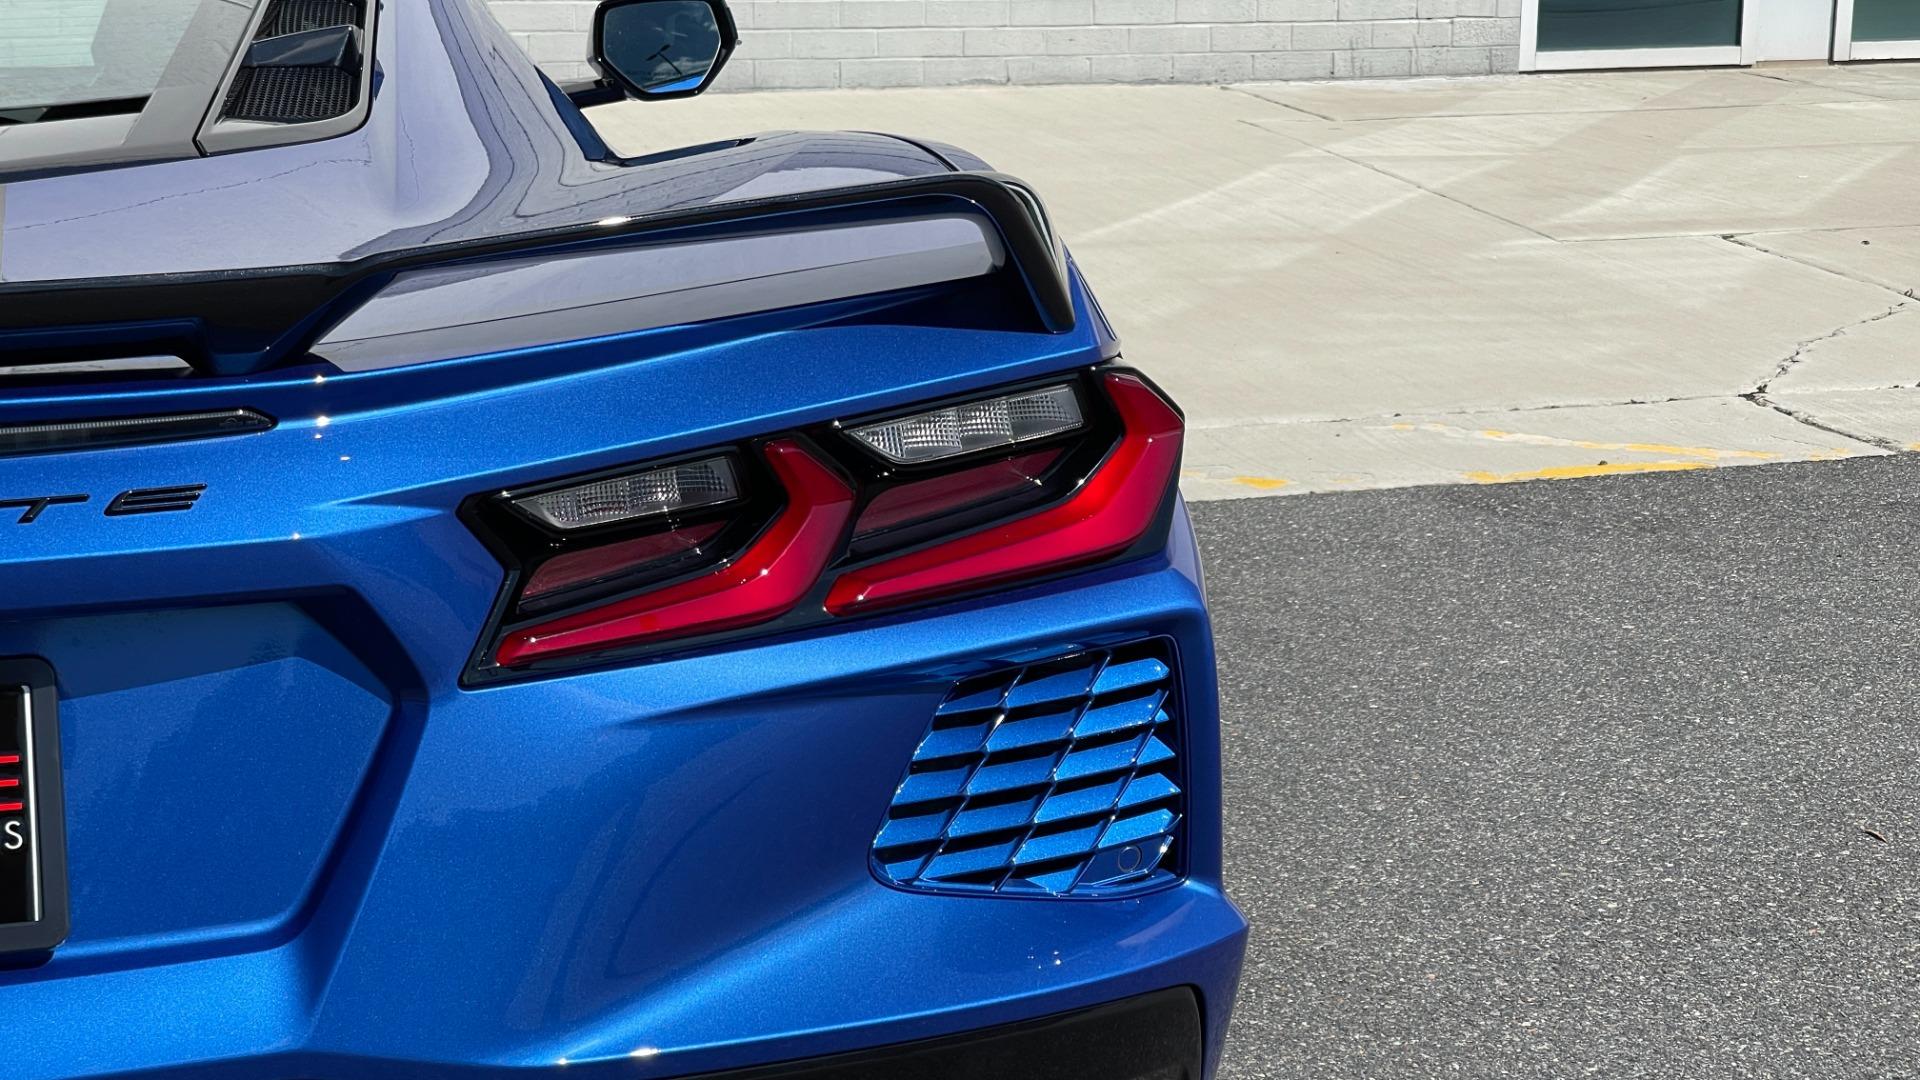 Used 2021 Chevrolet CORVETTE STINGRAY 3LT COUPE / 8-SPD / PERF PKG / NAV / BOSE / REARVIEW for sale $110,995 at Formula Imports in Charlotte NC 28227 25